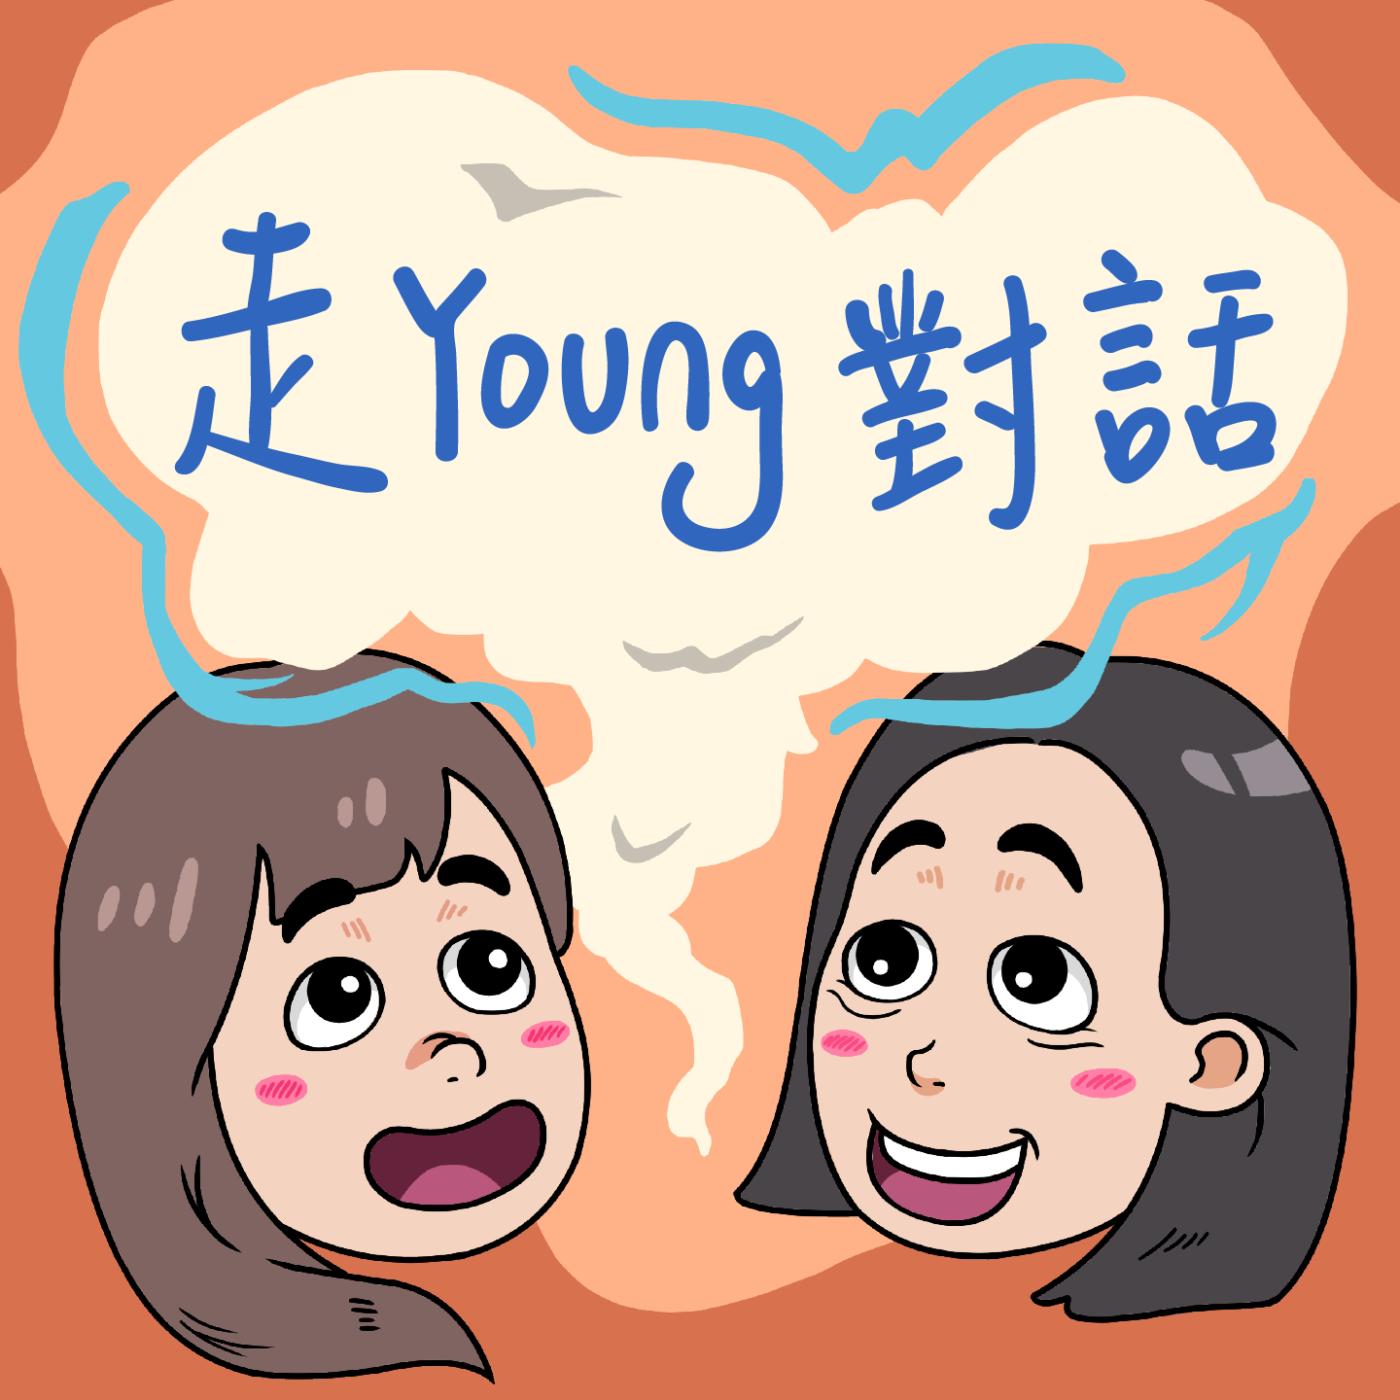 EP.0 節目名稱為什麼叫「走Young對話」?